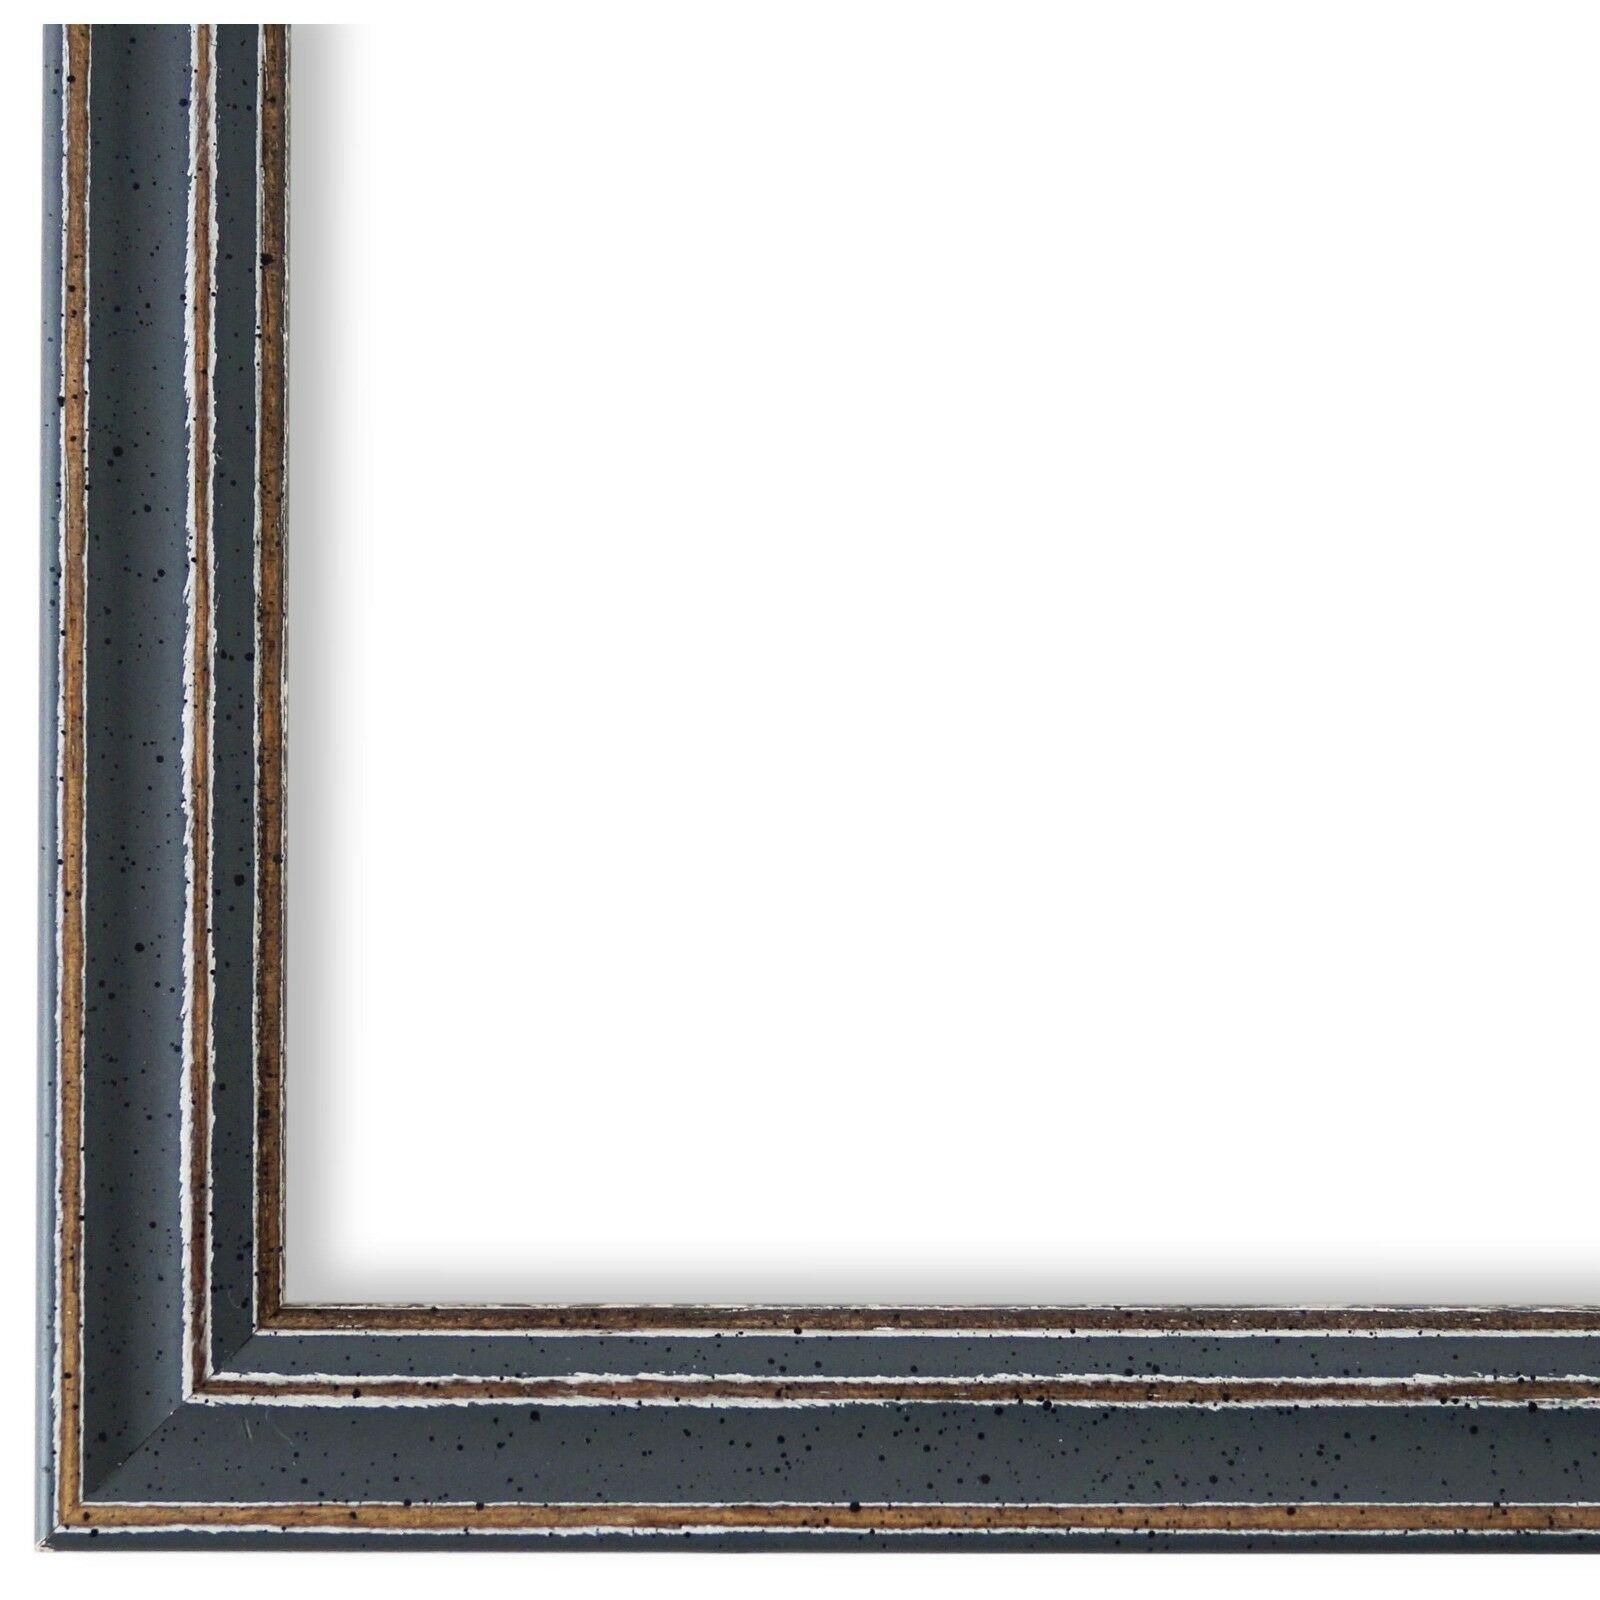 Bilderrahmen Grau Cosenza 2 0 9x13 10x10 10x15 13x18 15x20 18x24